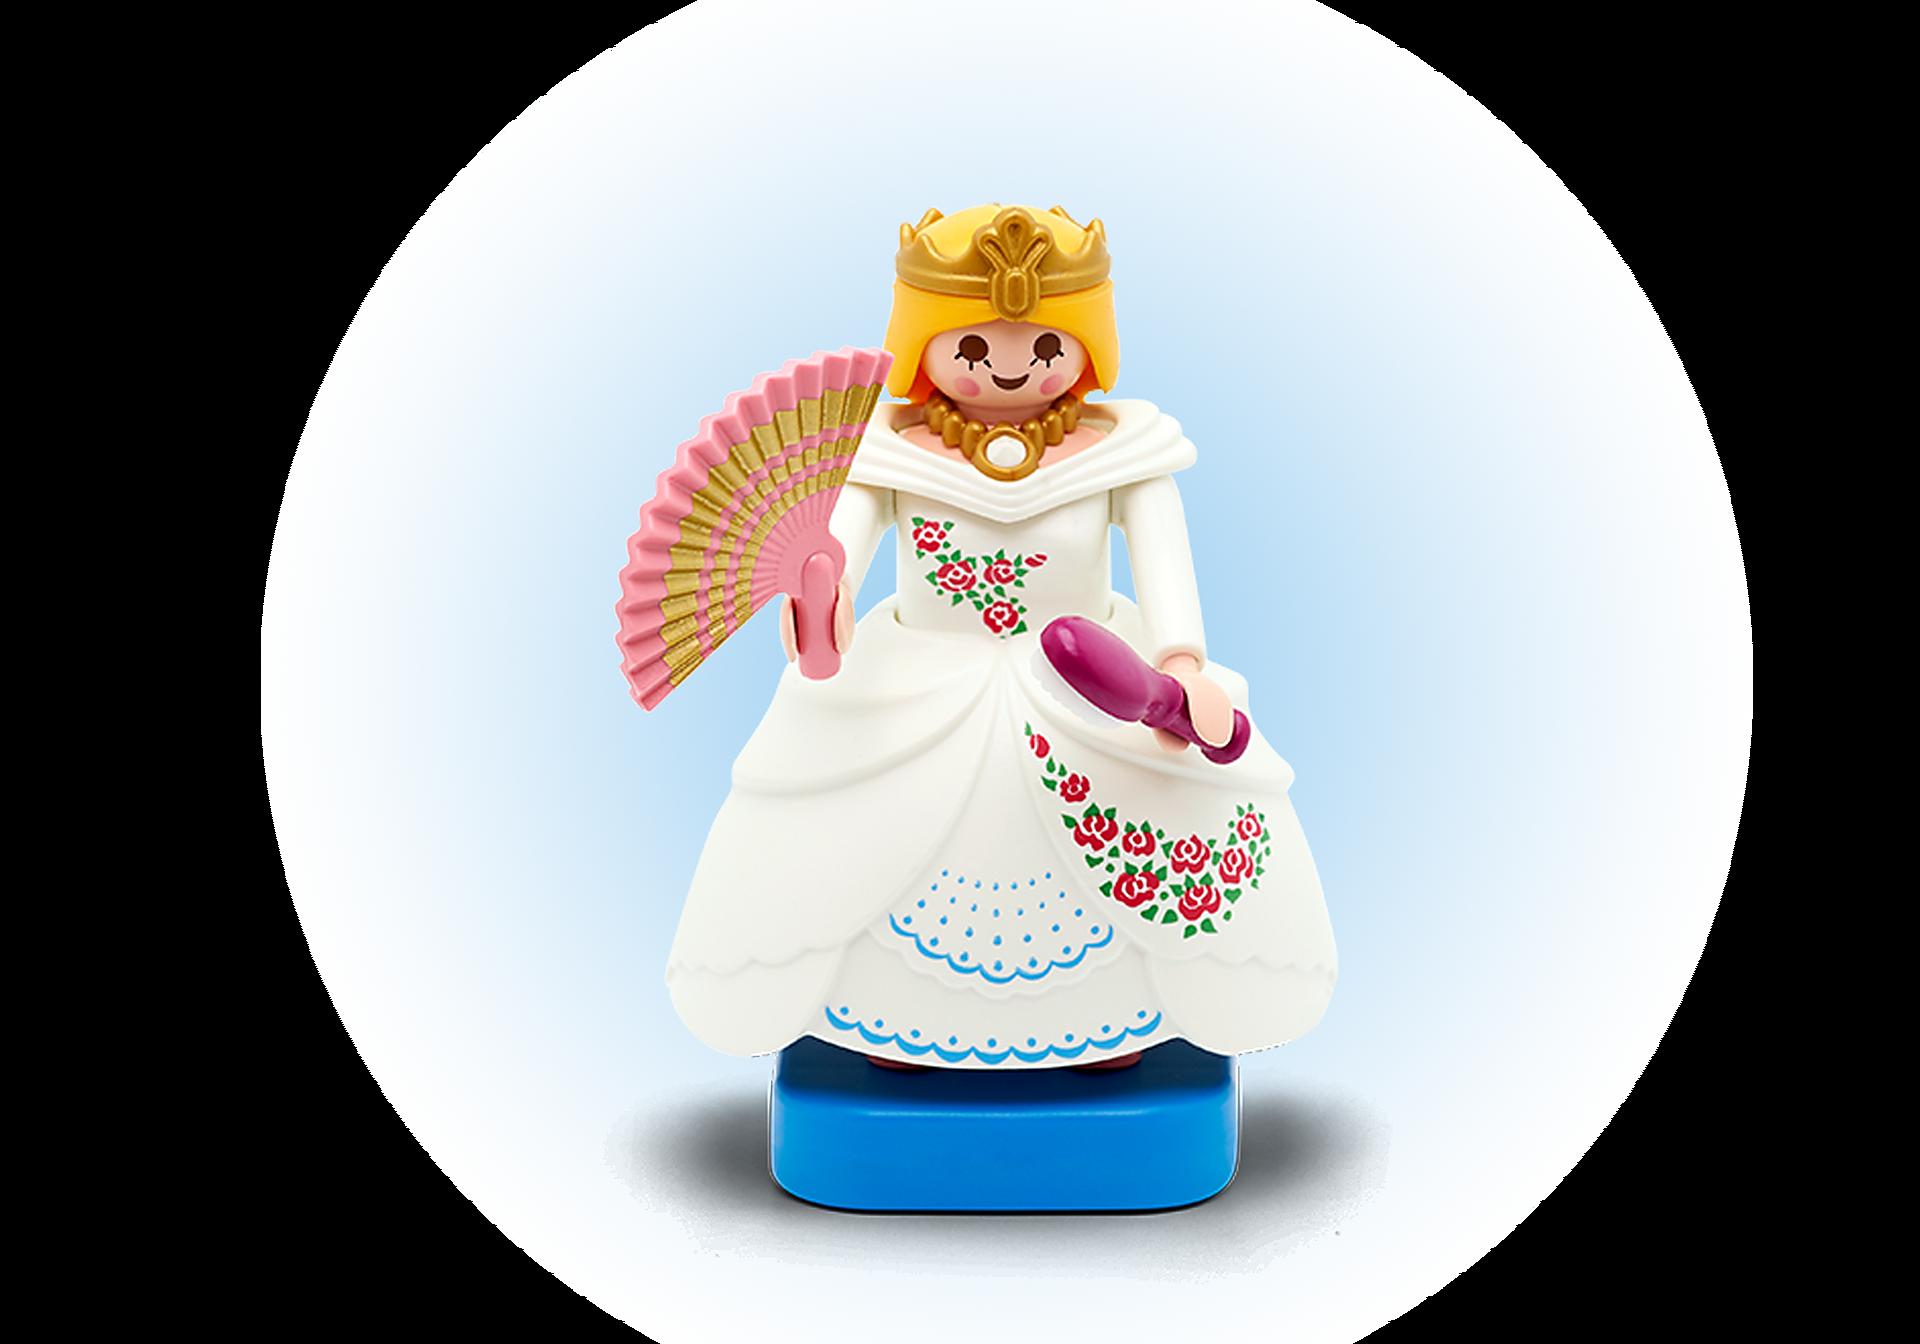 http://media.playmobil.com/i/playmobil/80404_product_detail/Tonie-Clip + PLAYMOBIL-Figur PRINZESSIN für toniebox